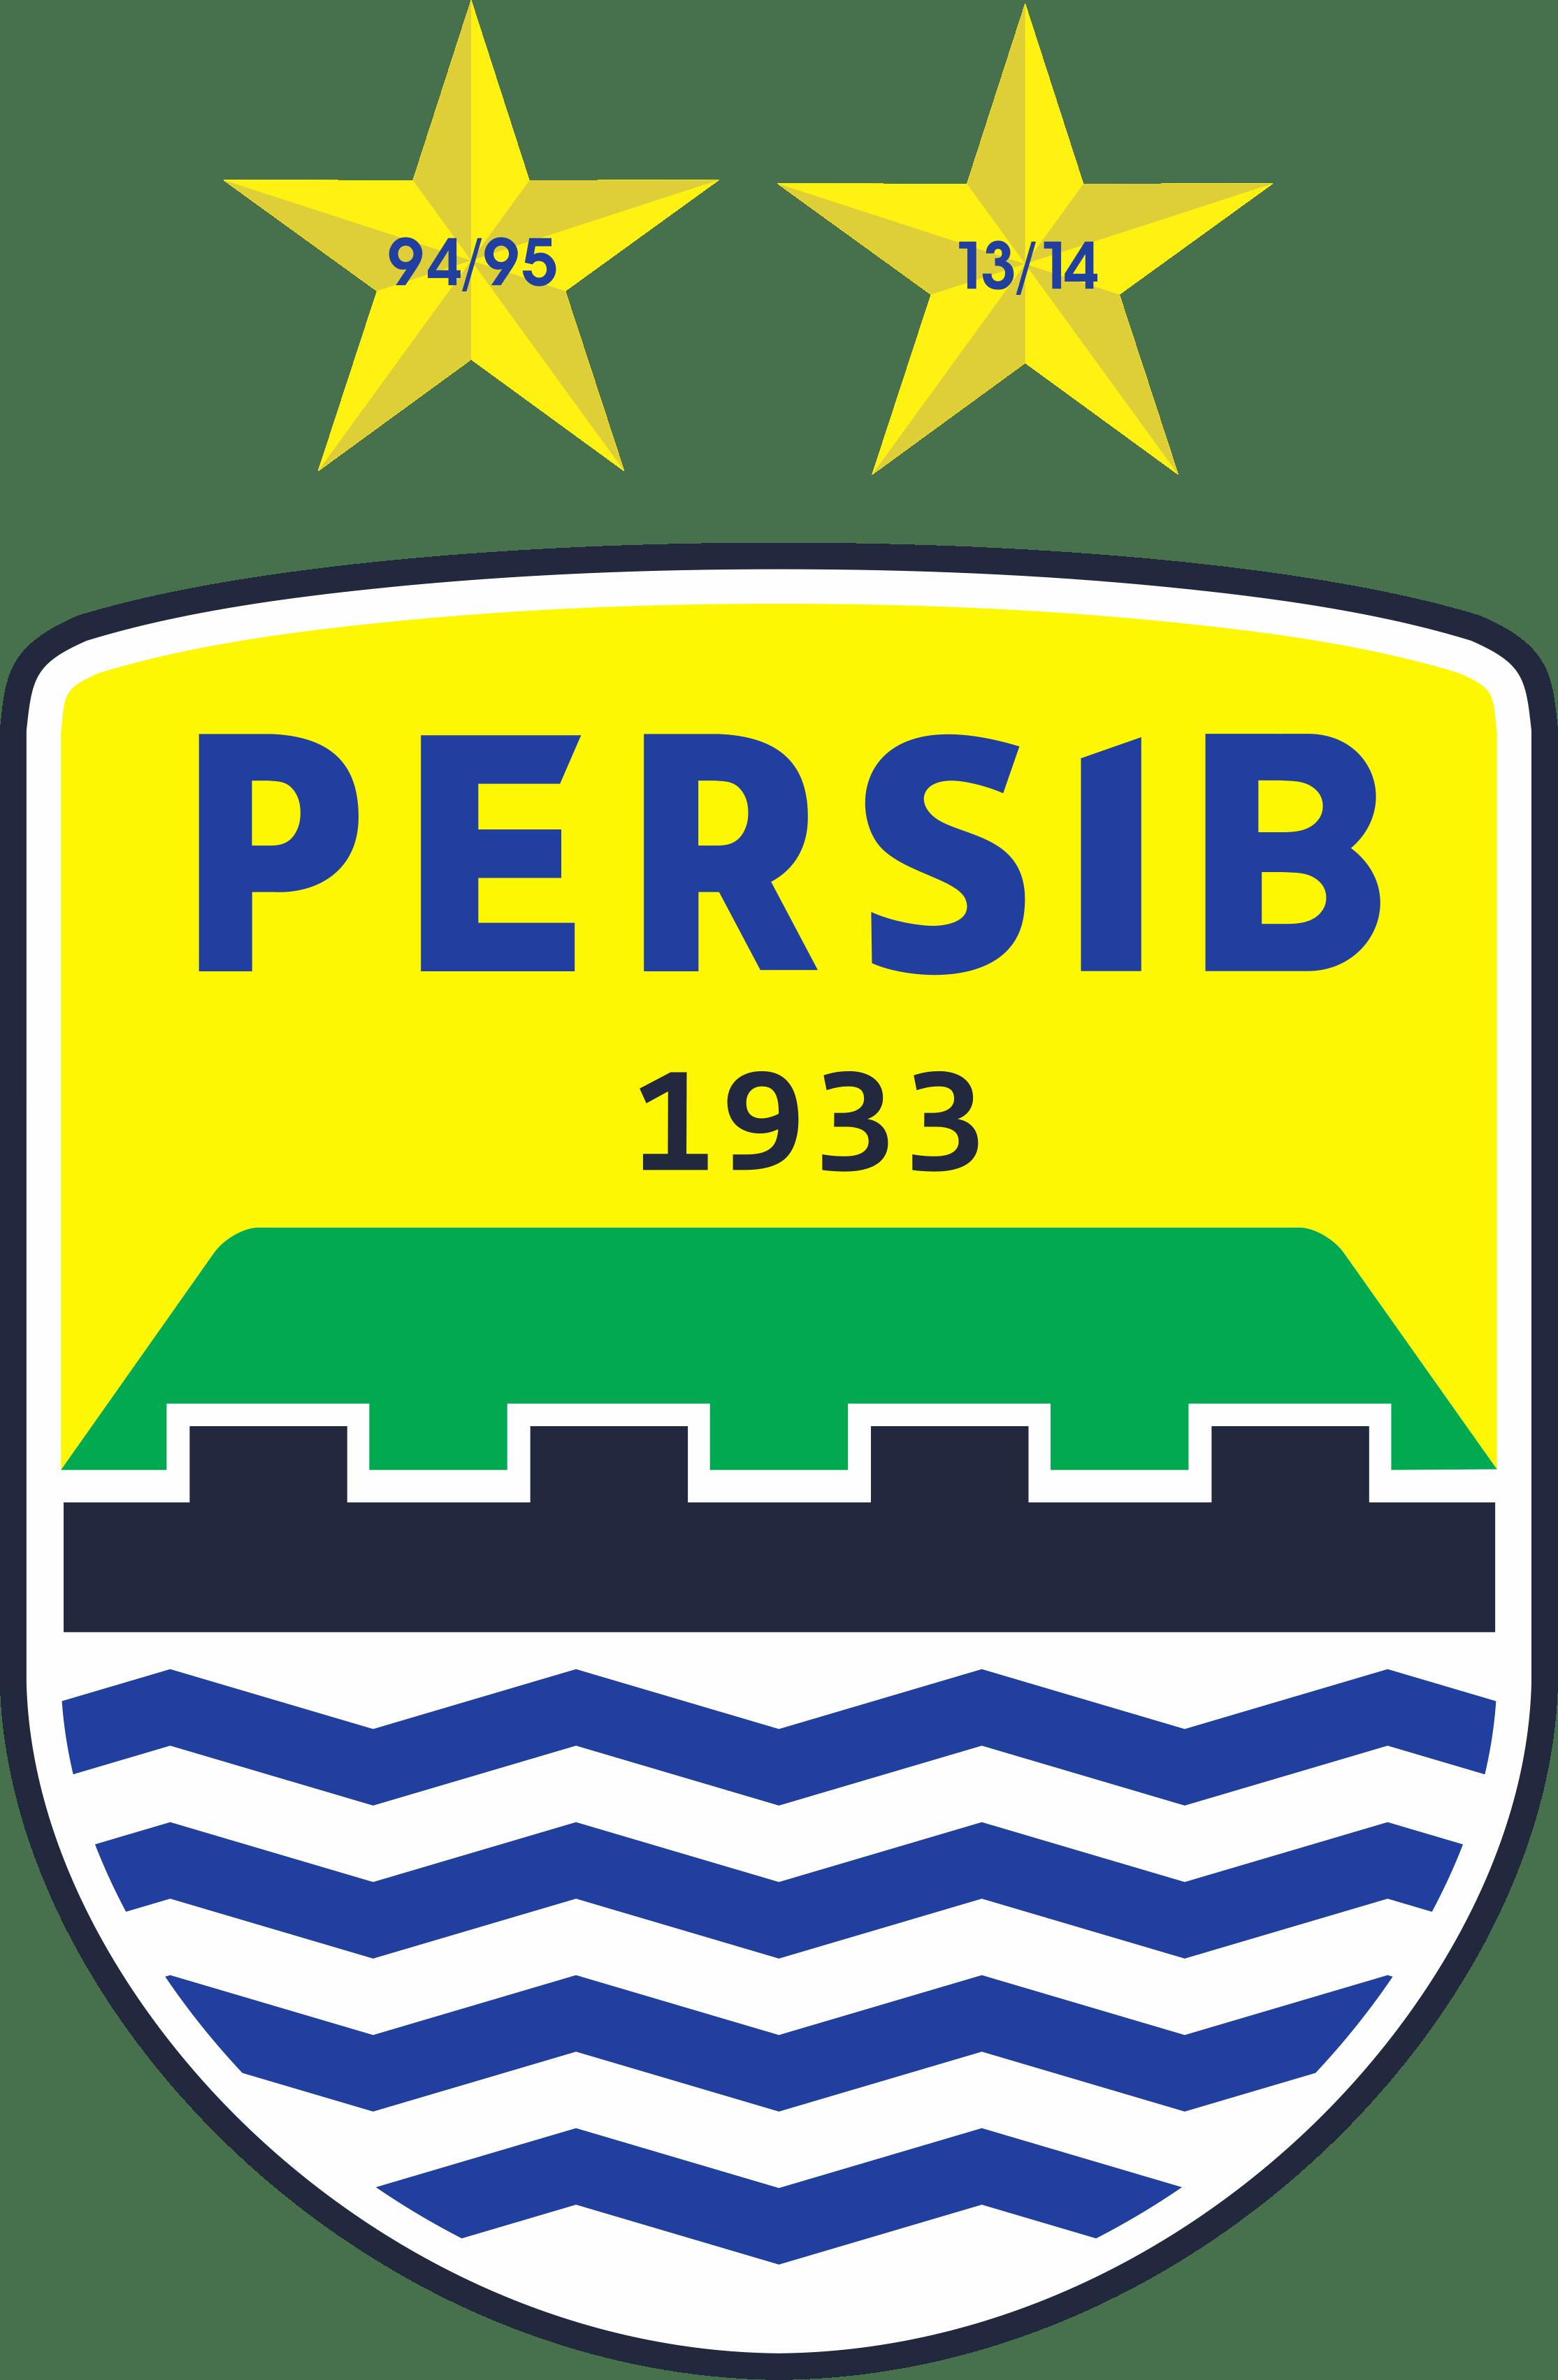 Persib Logo png